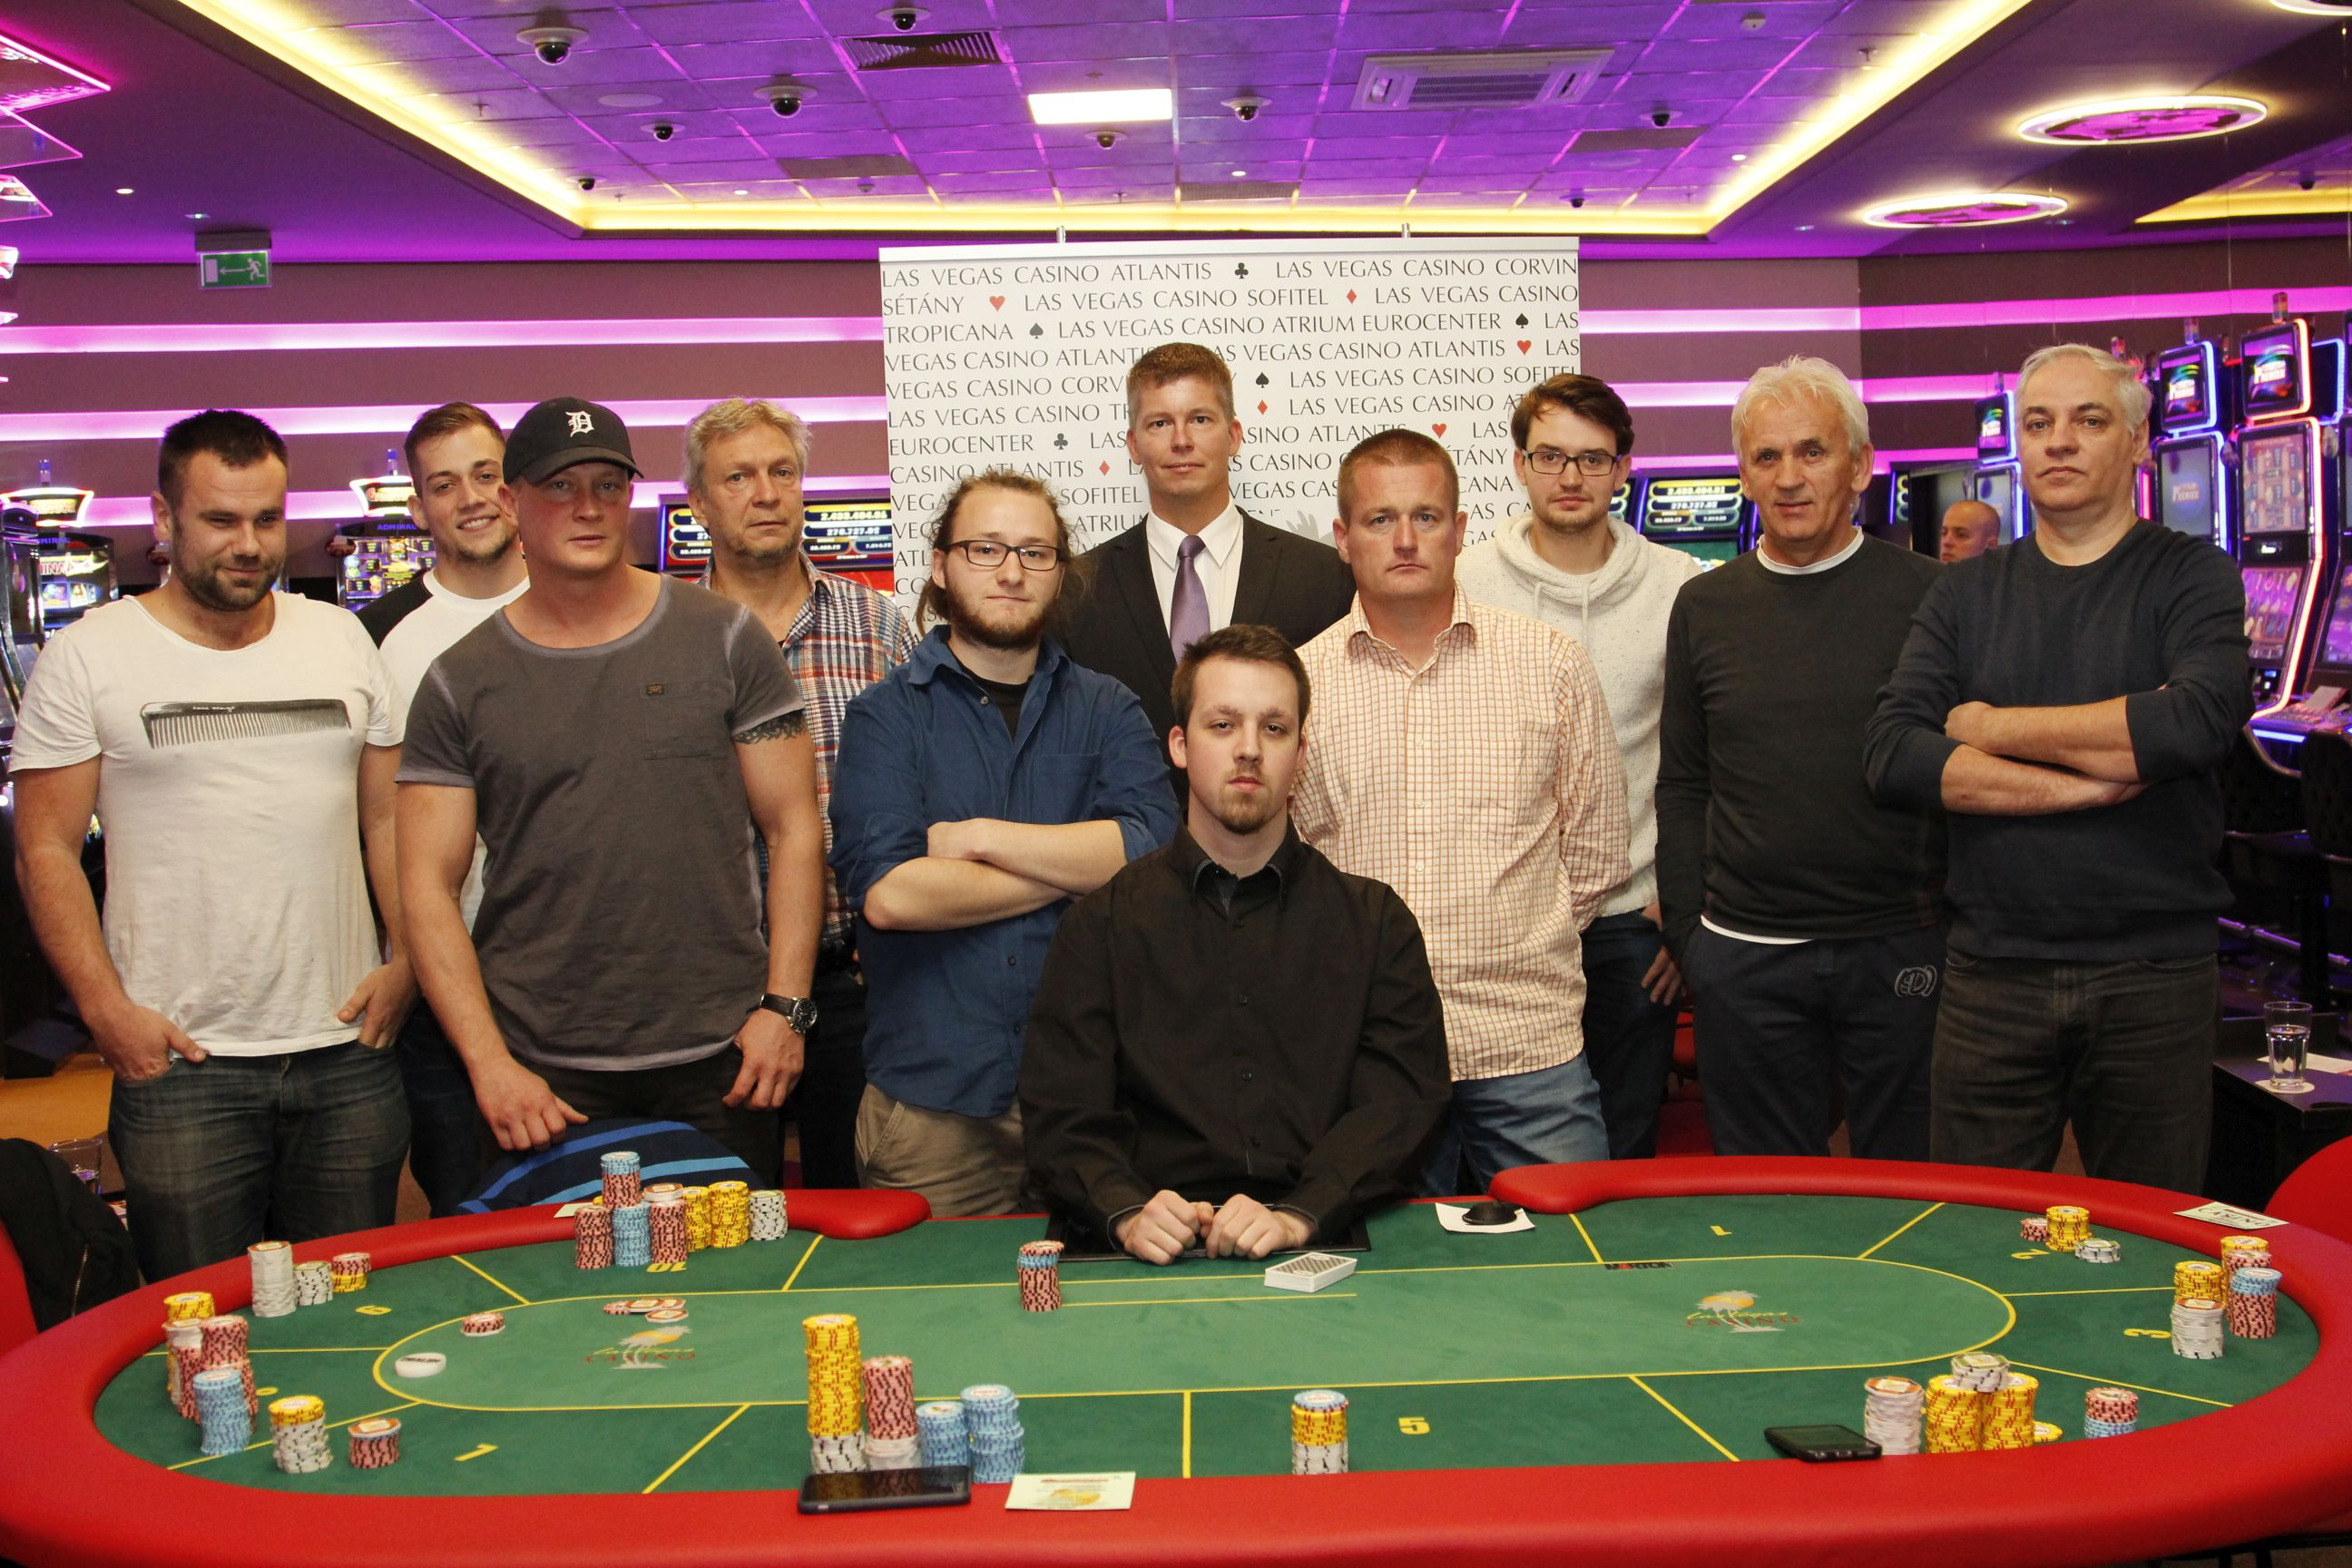 турниры в казино колумб